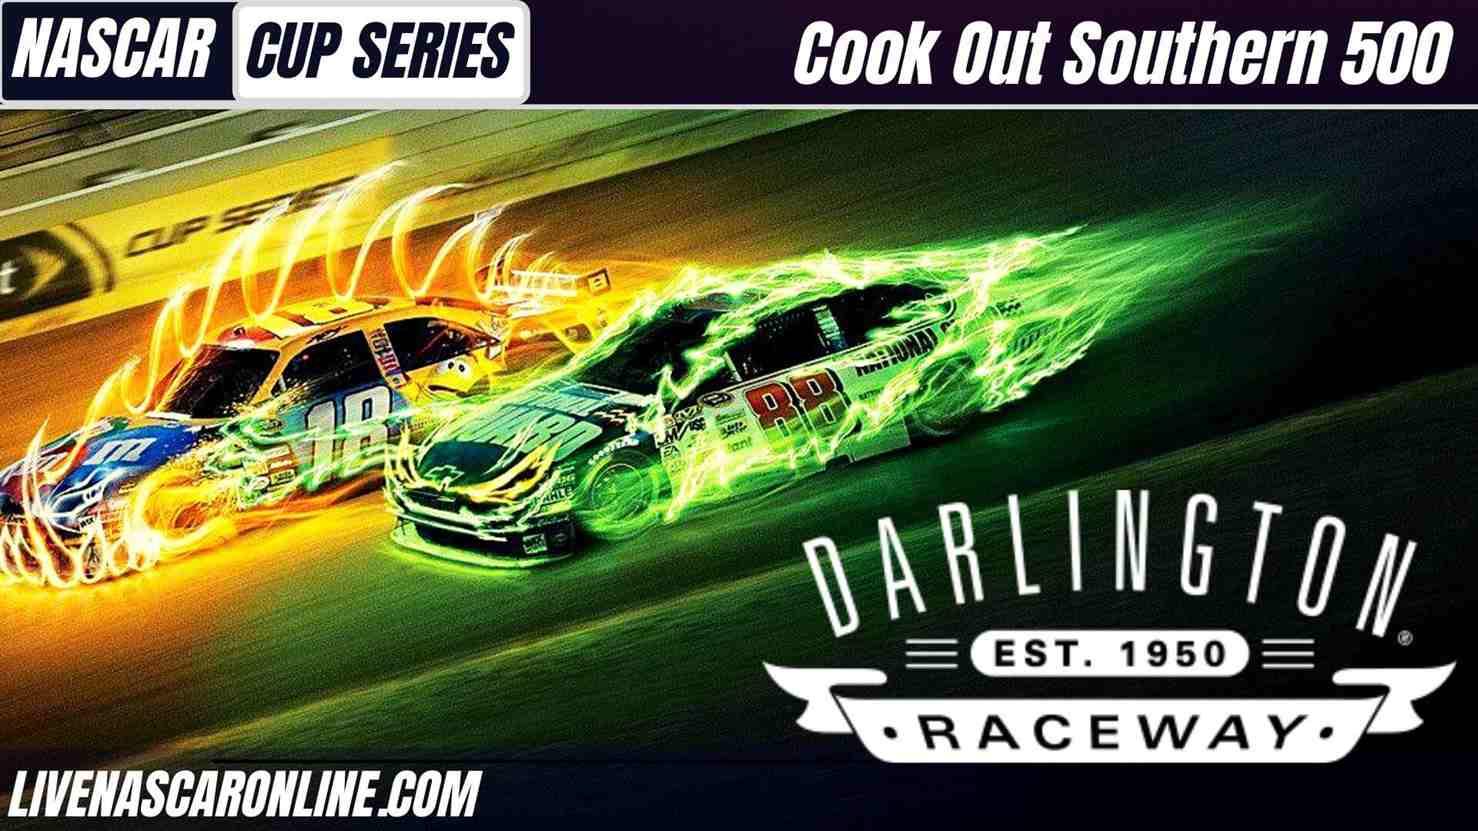 Cook Out Southern 500 NASCAR Darlington Live Stream